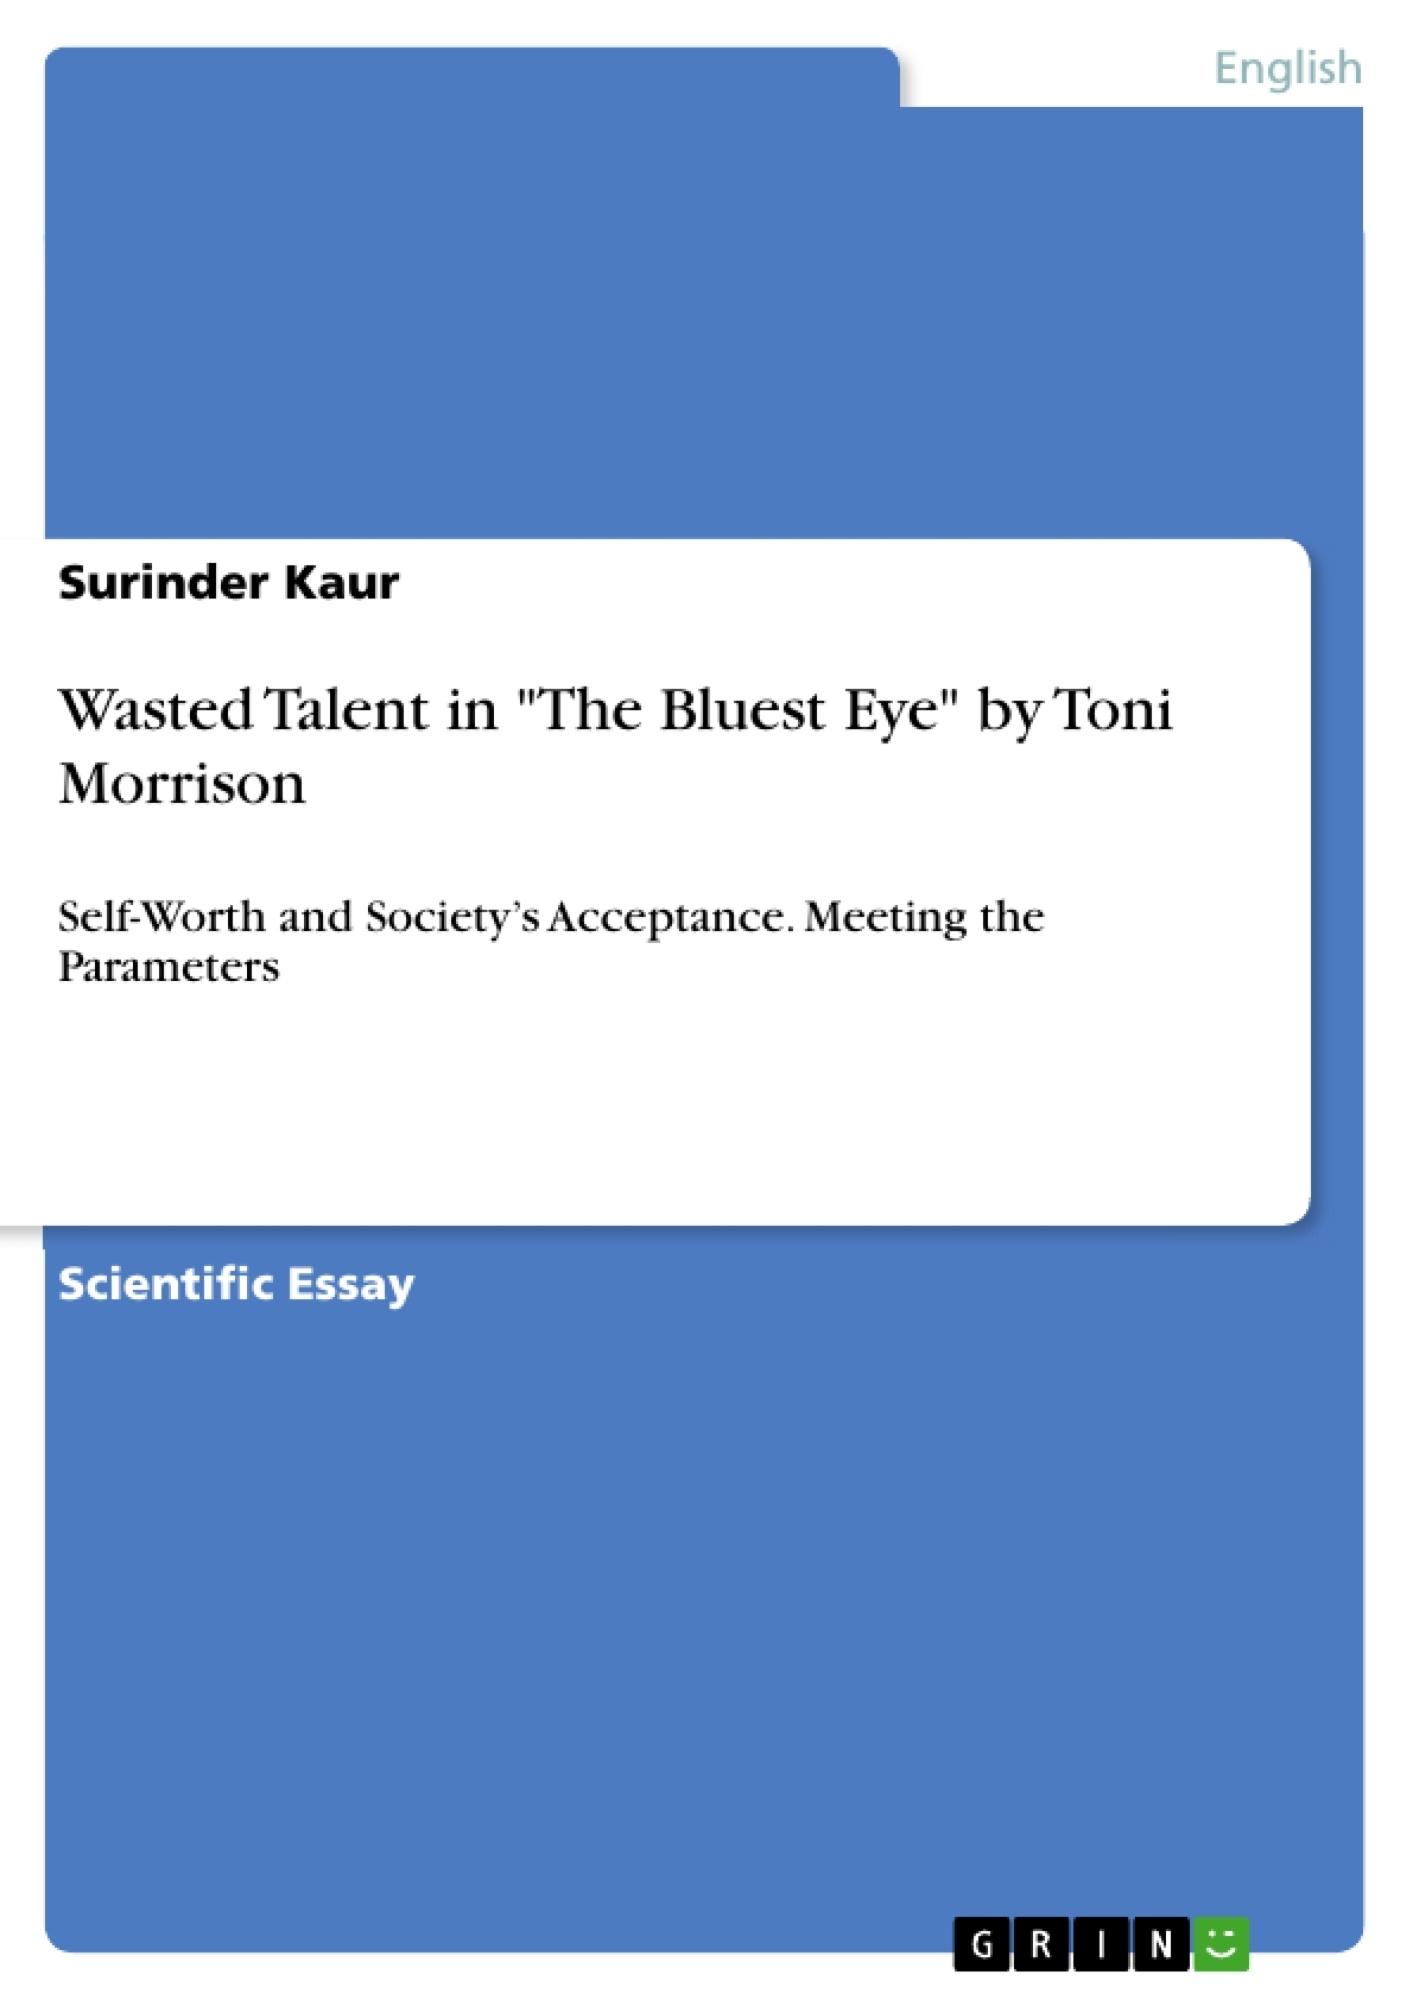 the bluest eye essay thesis